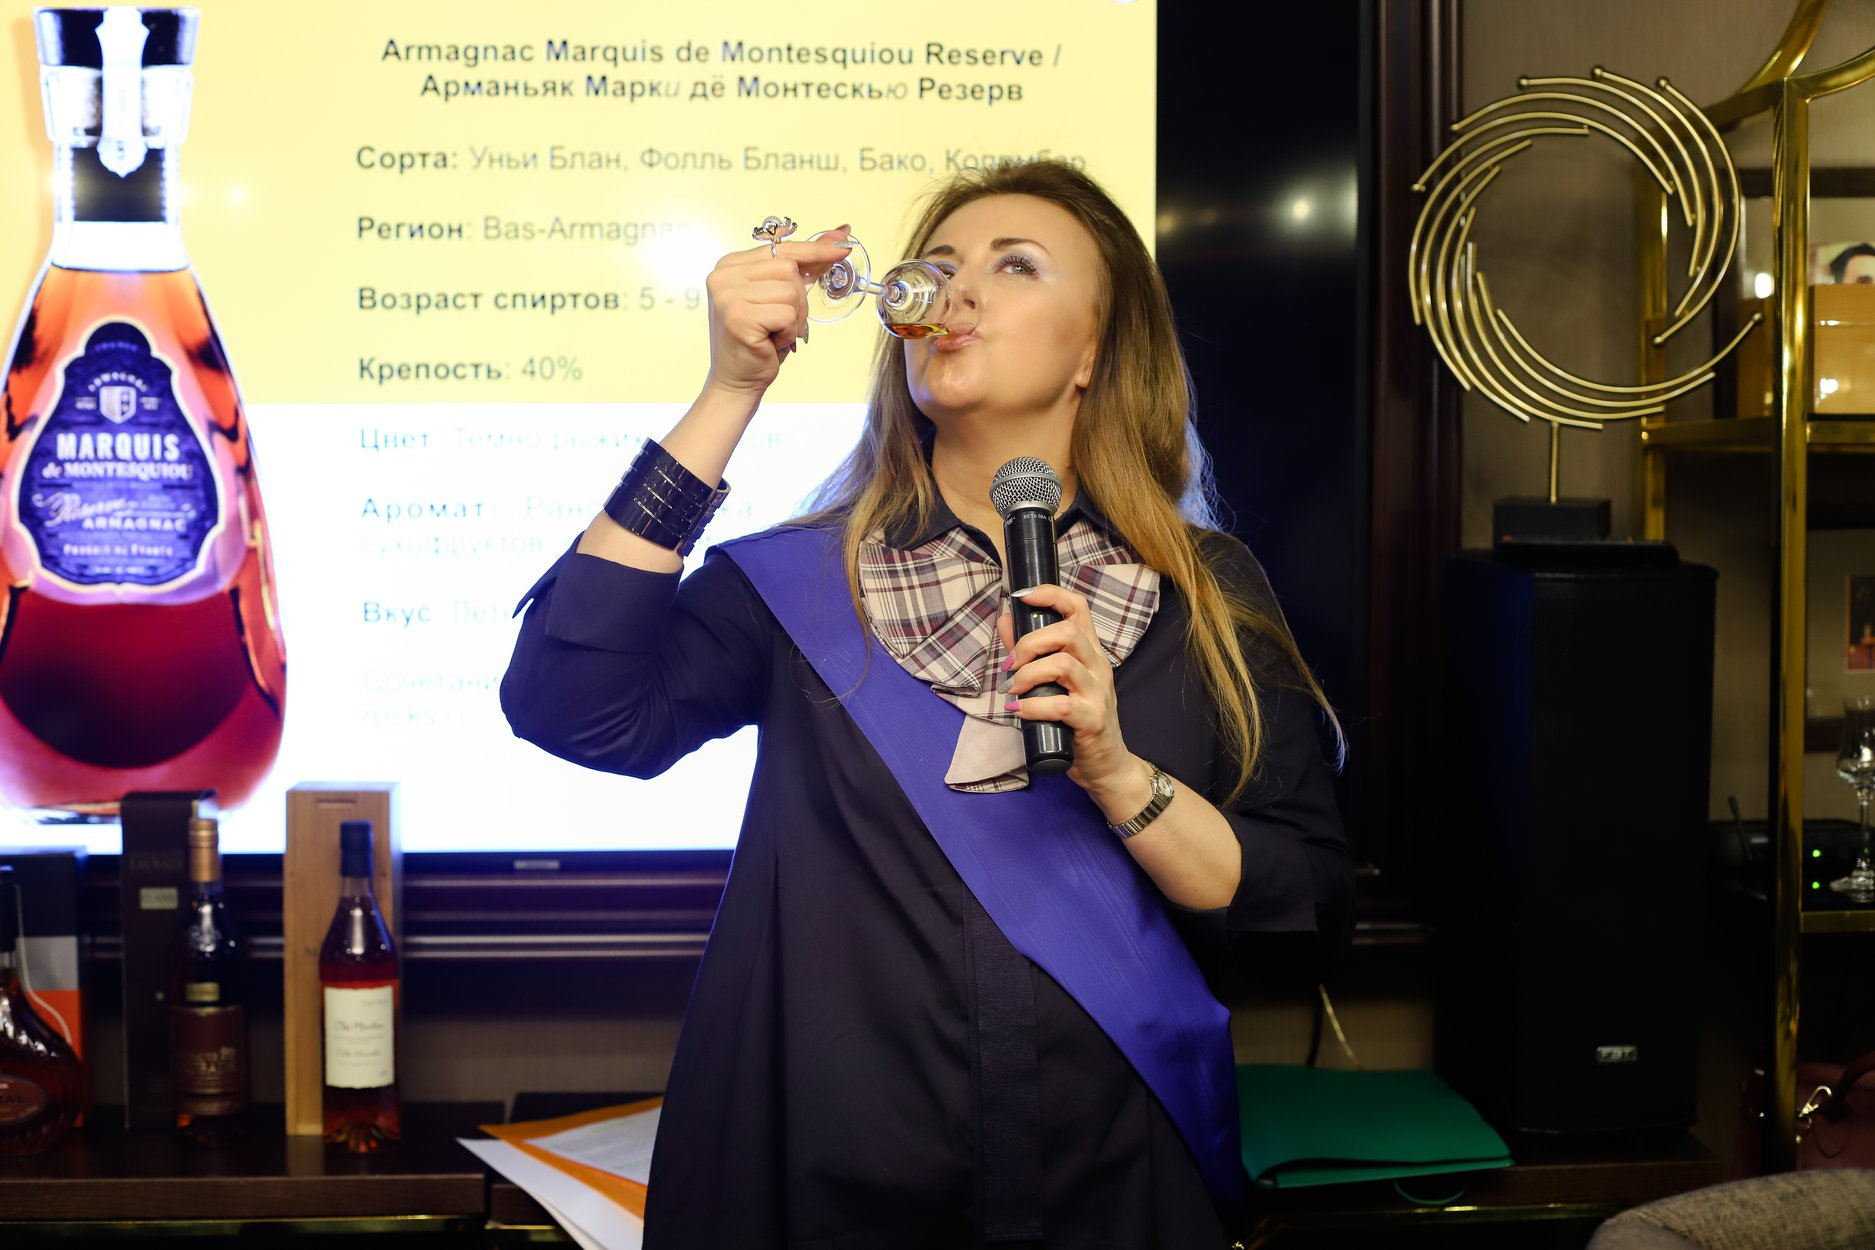 фотоотчёт от 2 марта 2020 года мероприятие от Московского Сигарного Клуба